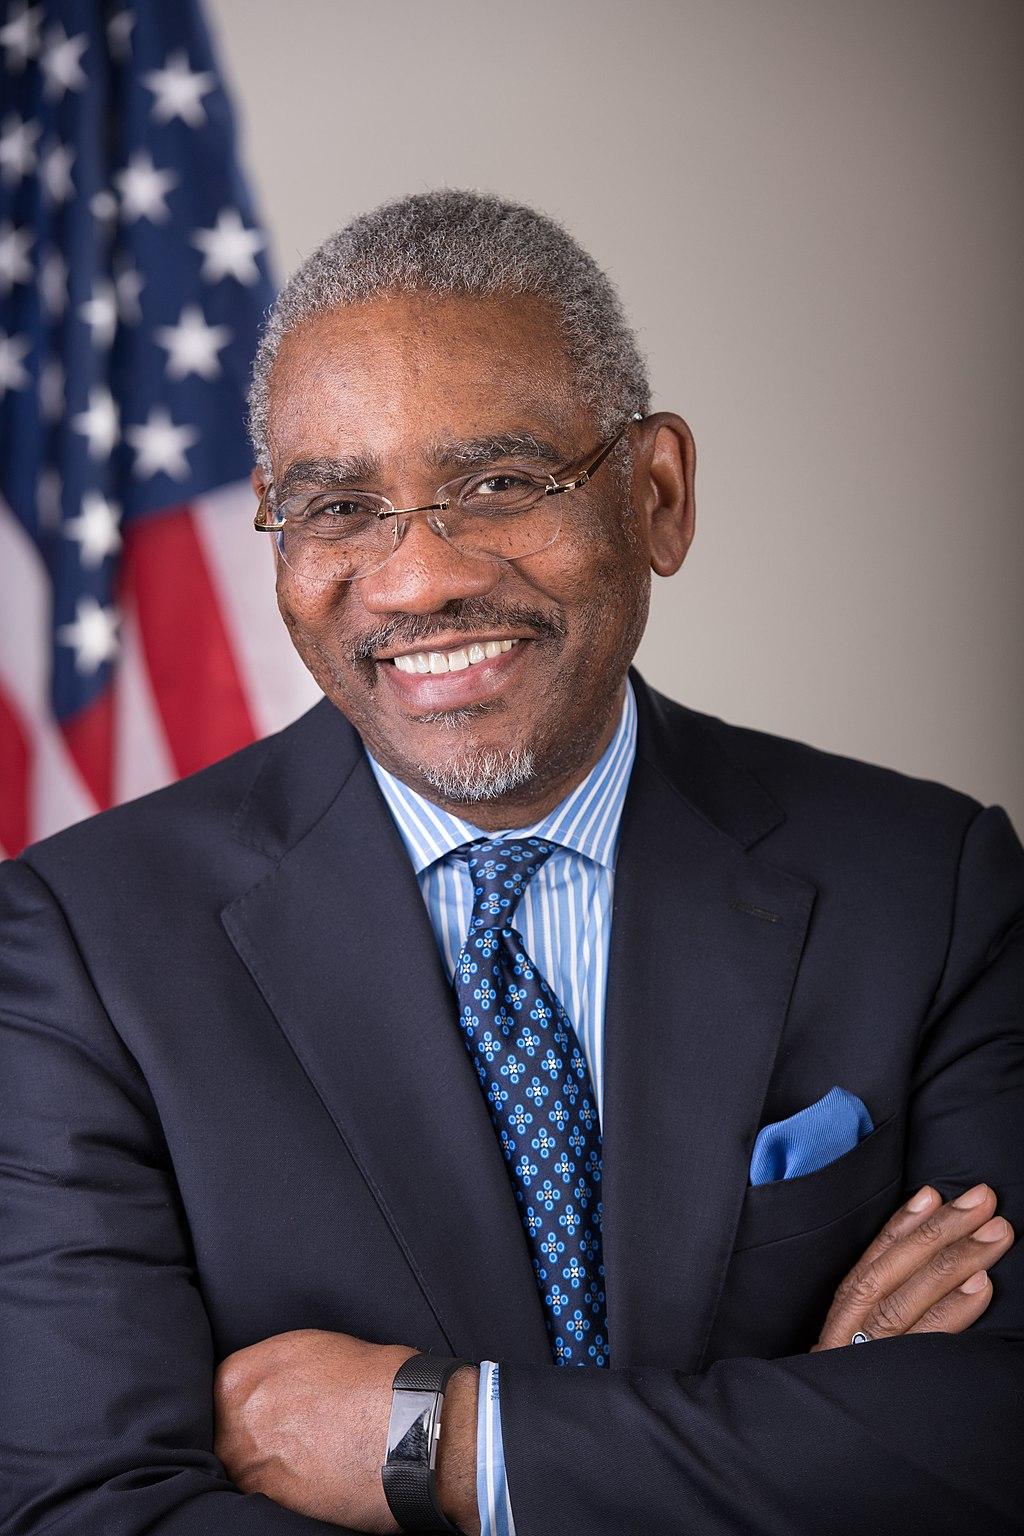 Congressman Gregory W. Meeks